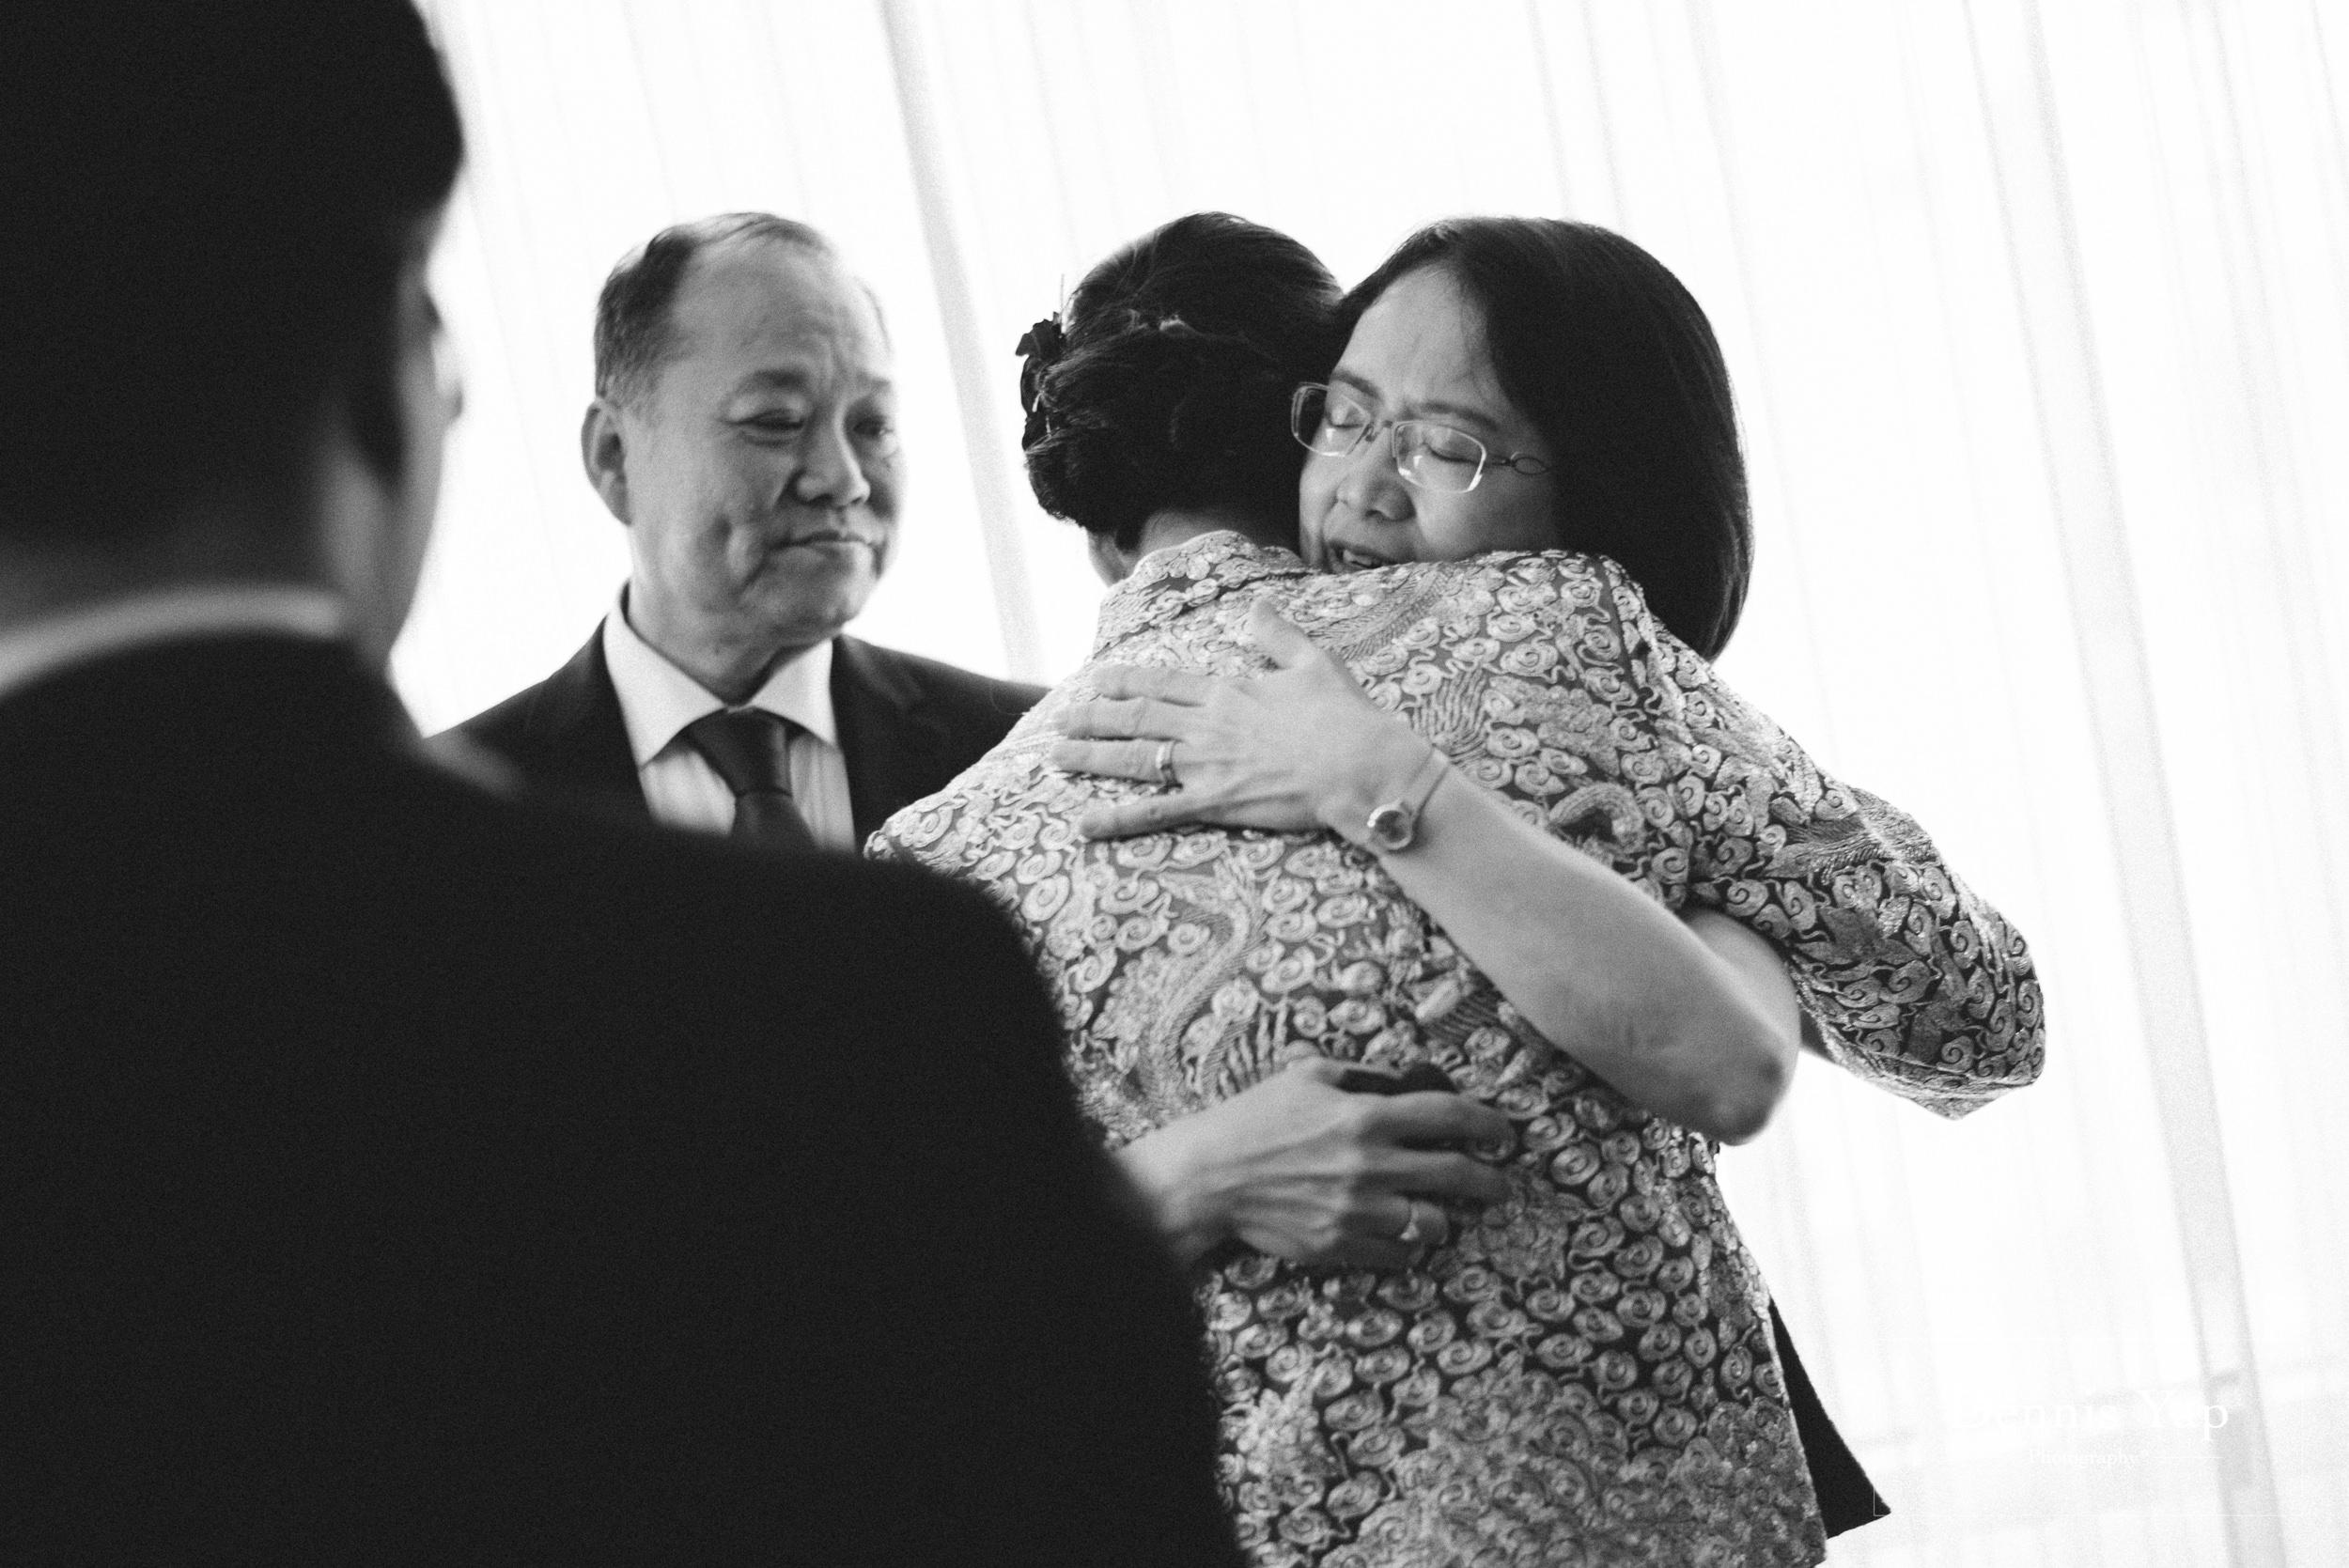 wai keong jenny wedding day bangsar dennis yap photography emotions beloved family-17.jpg